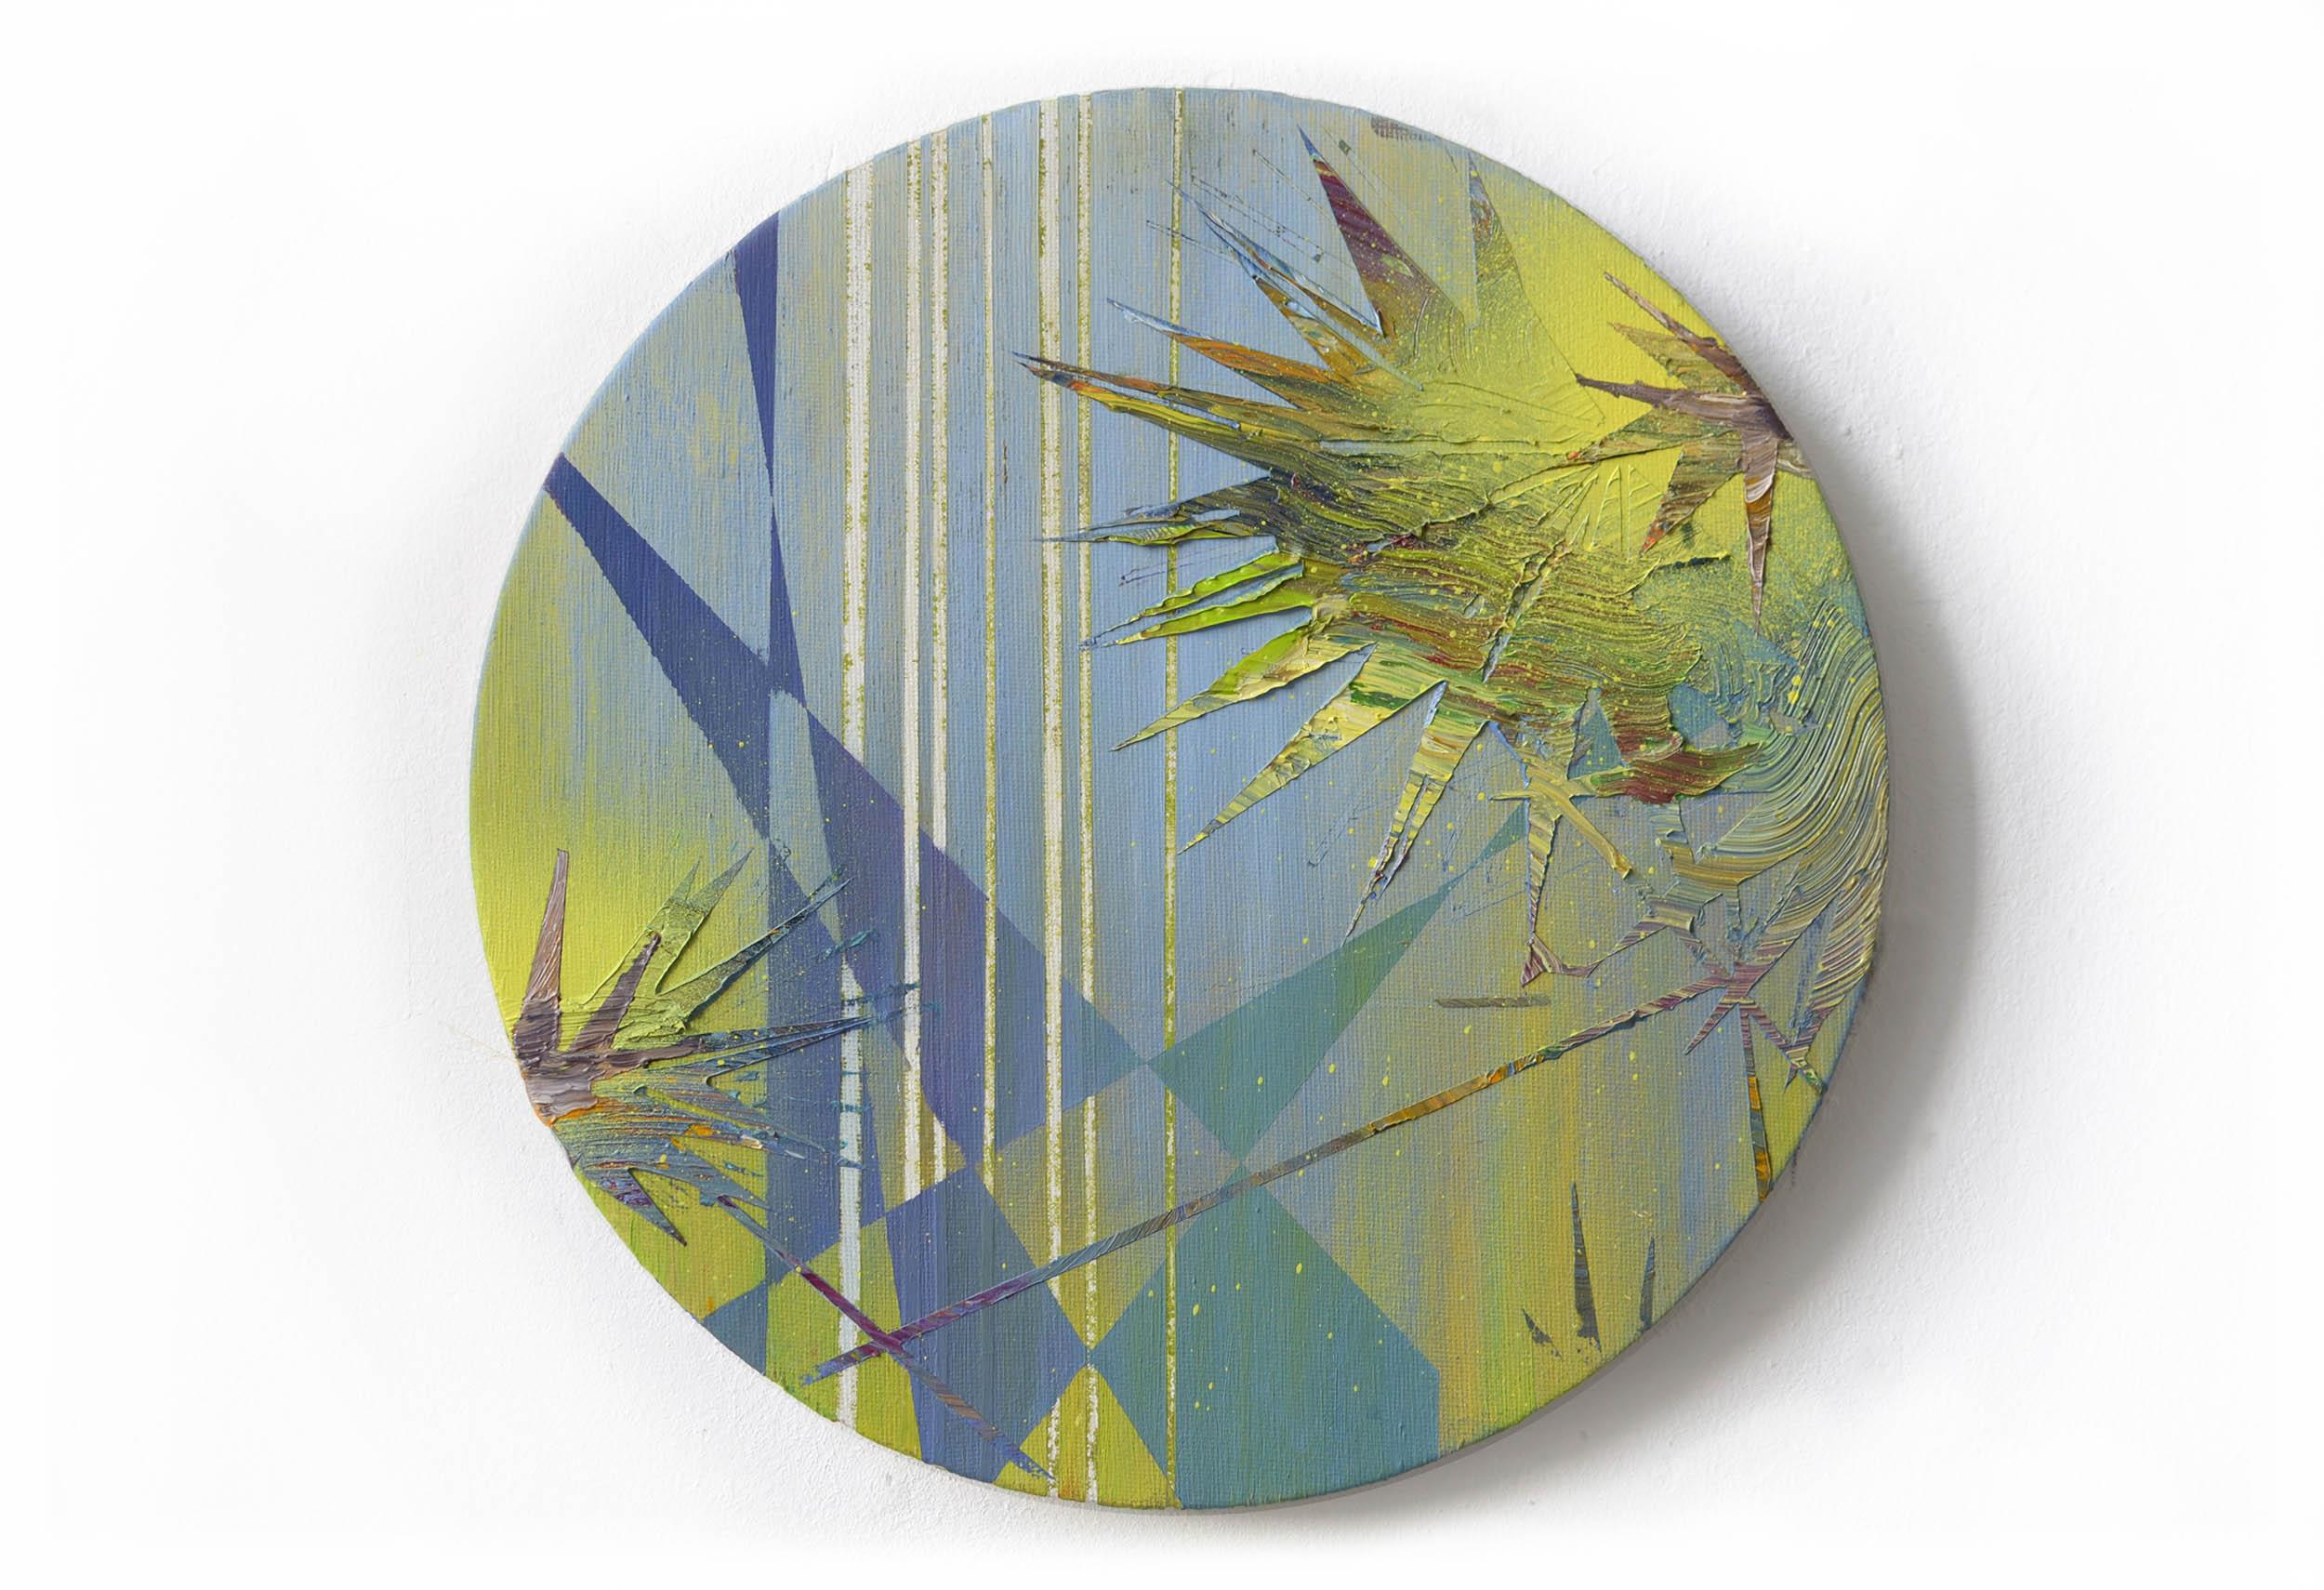 Volta I  oil on canvas 30 x 30 cm, 2013